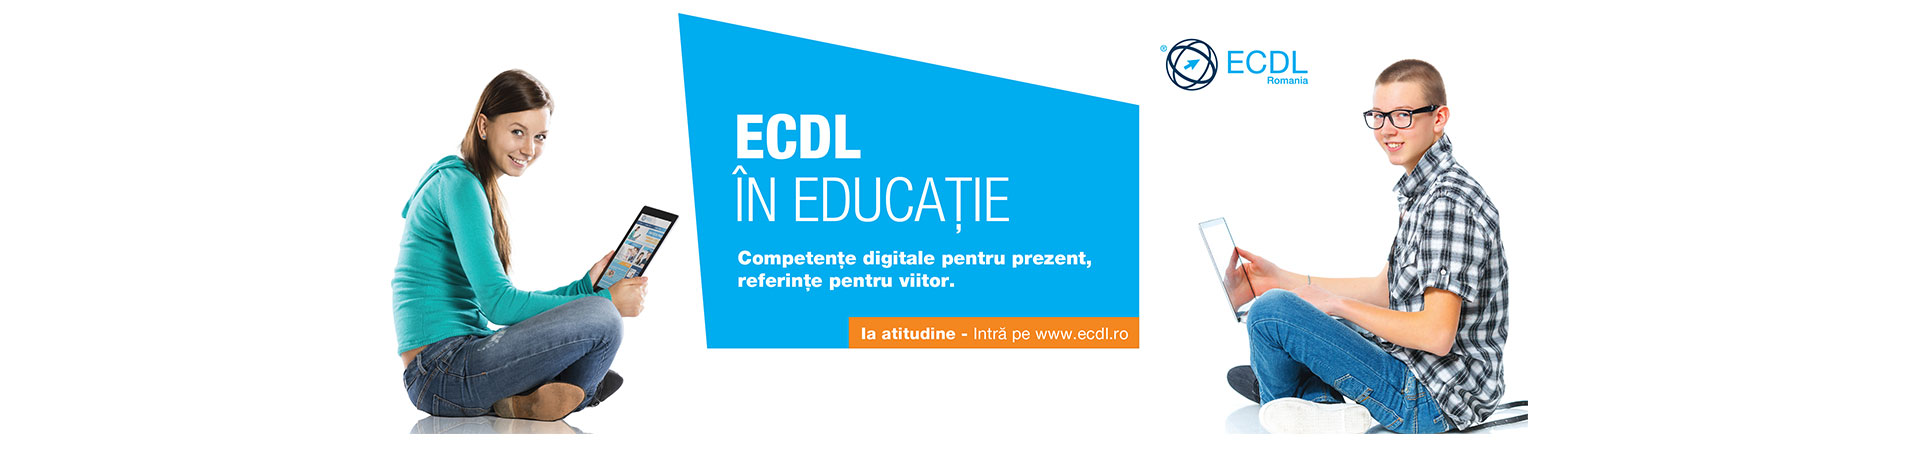 banner-ecdl